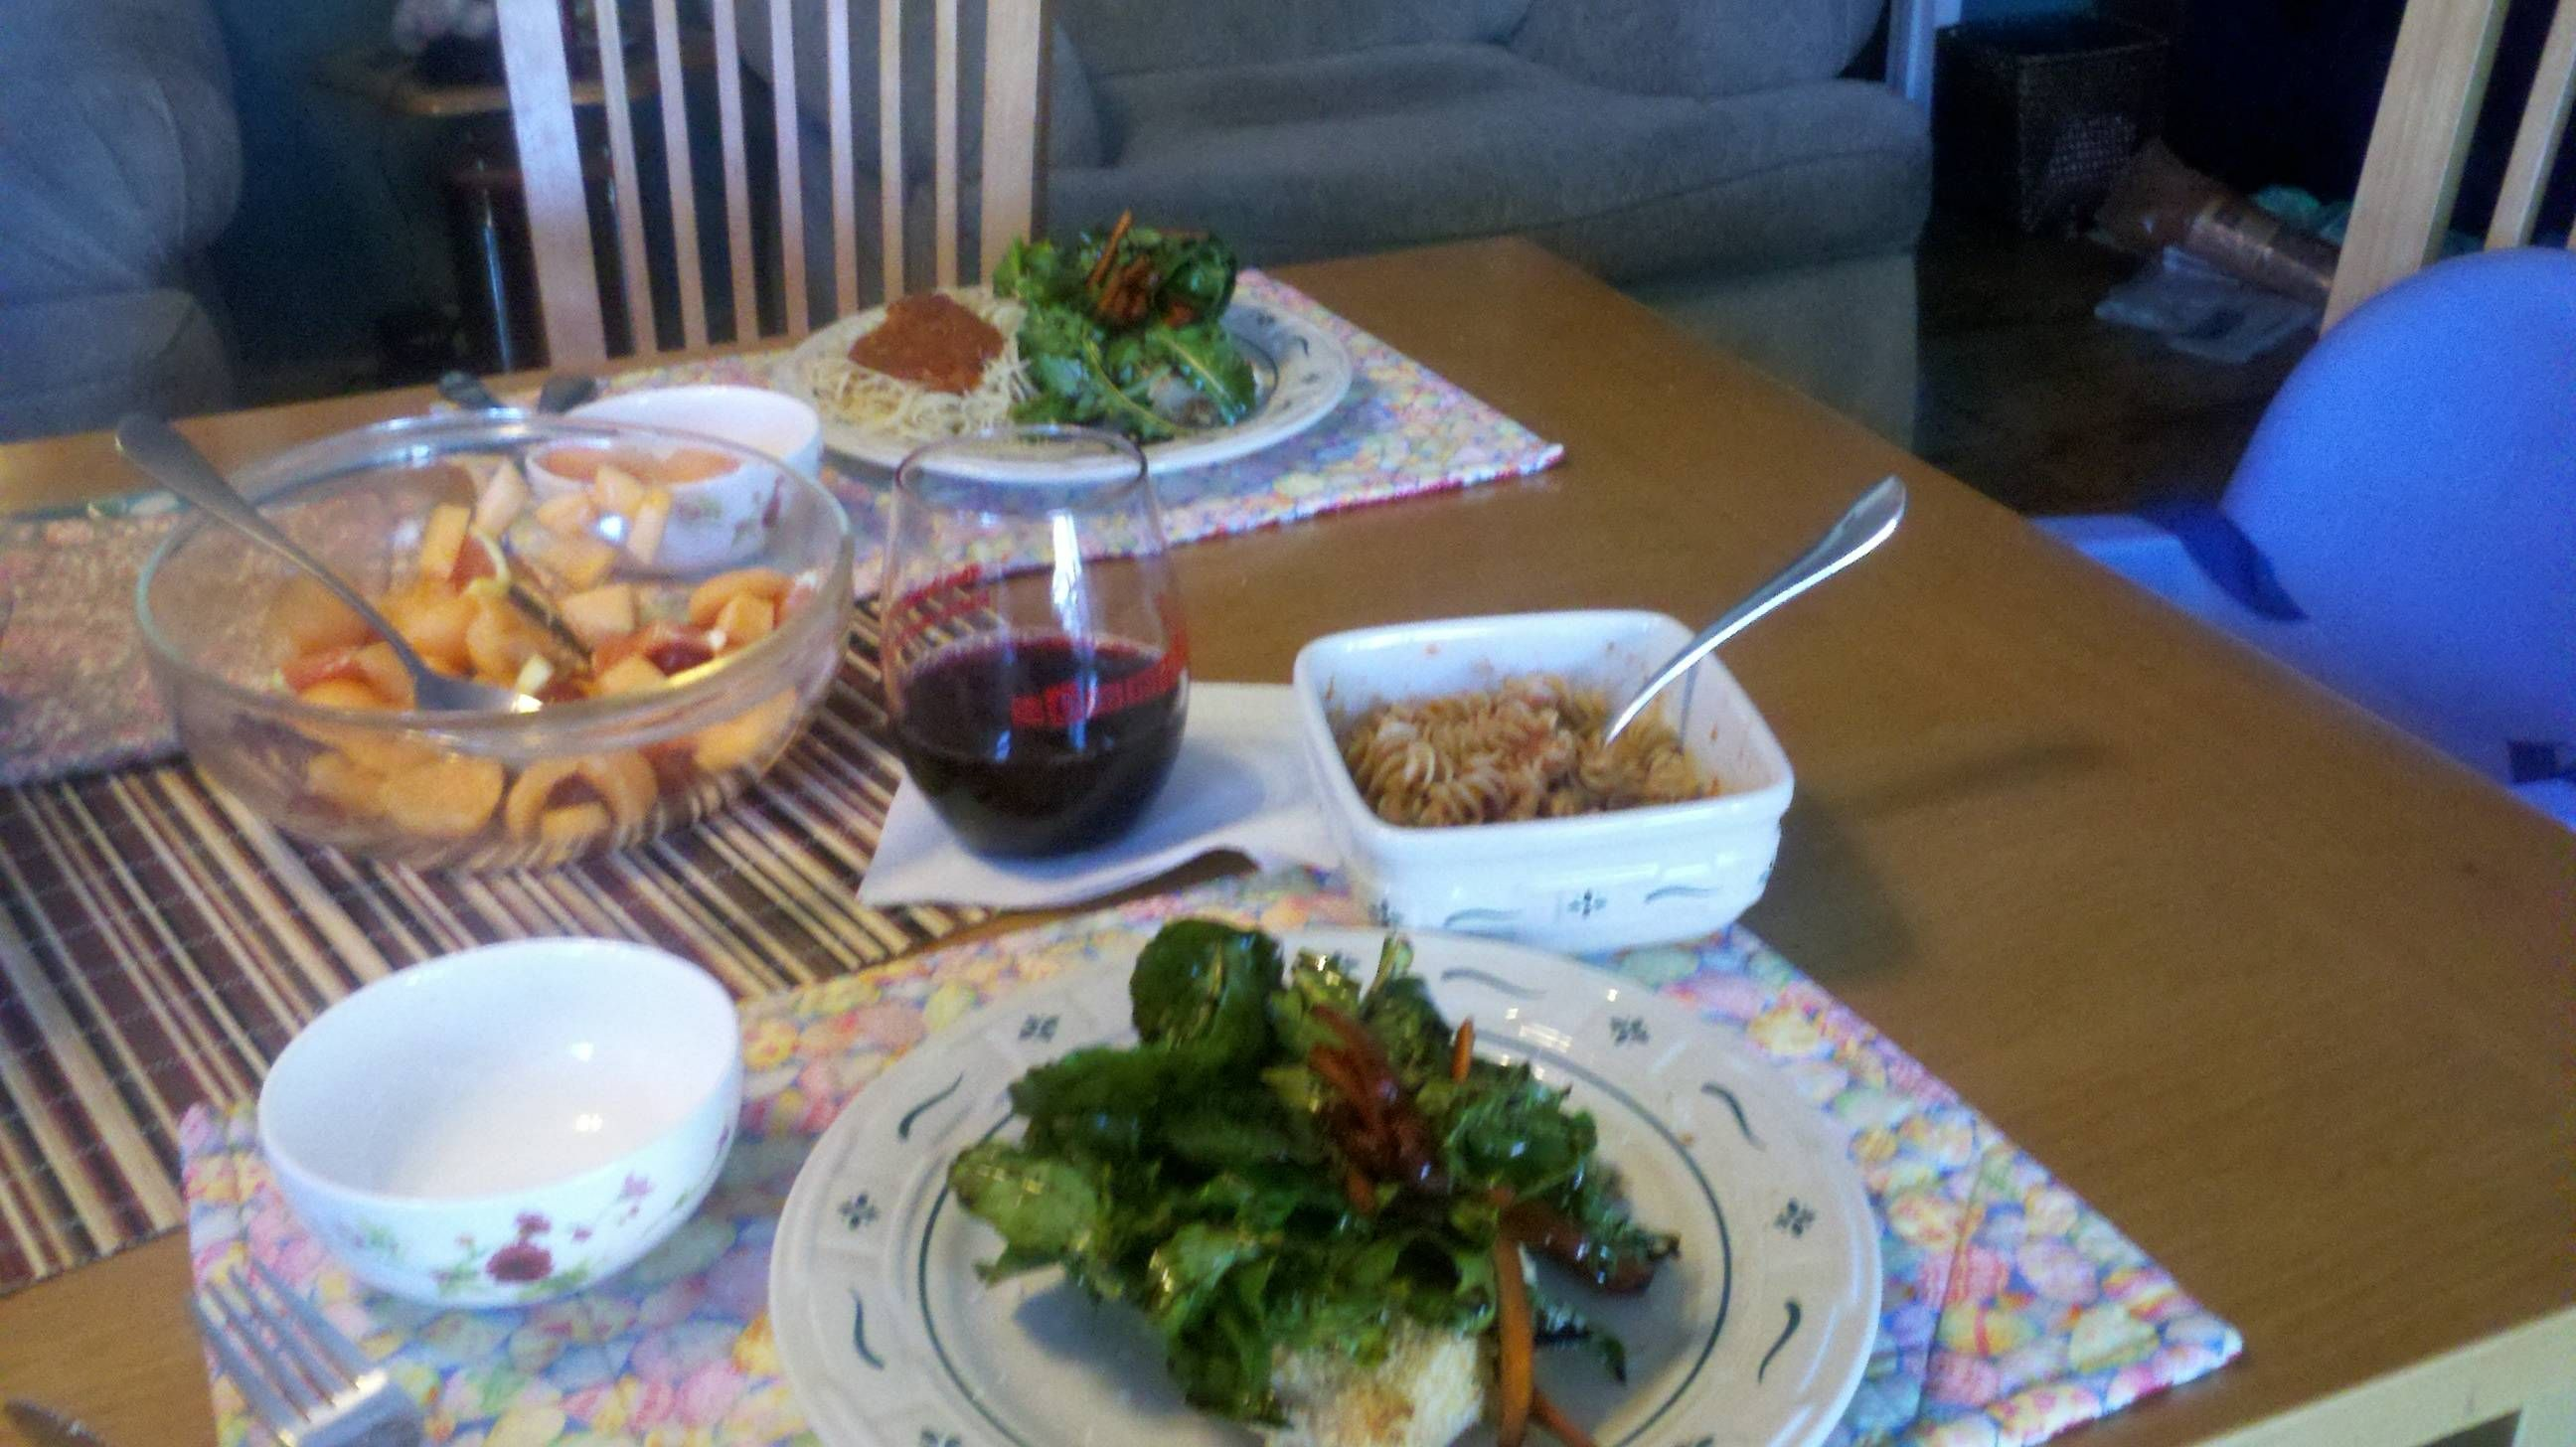 Delish low cal dinner....minus the wine :) Panko crusted chicken, arugula/basil salad w/ bals ...